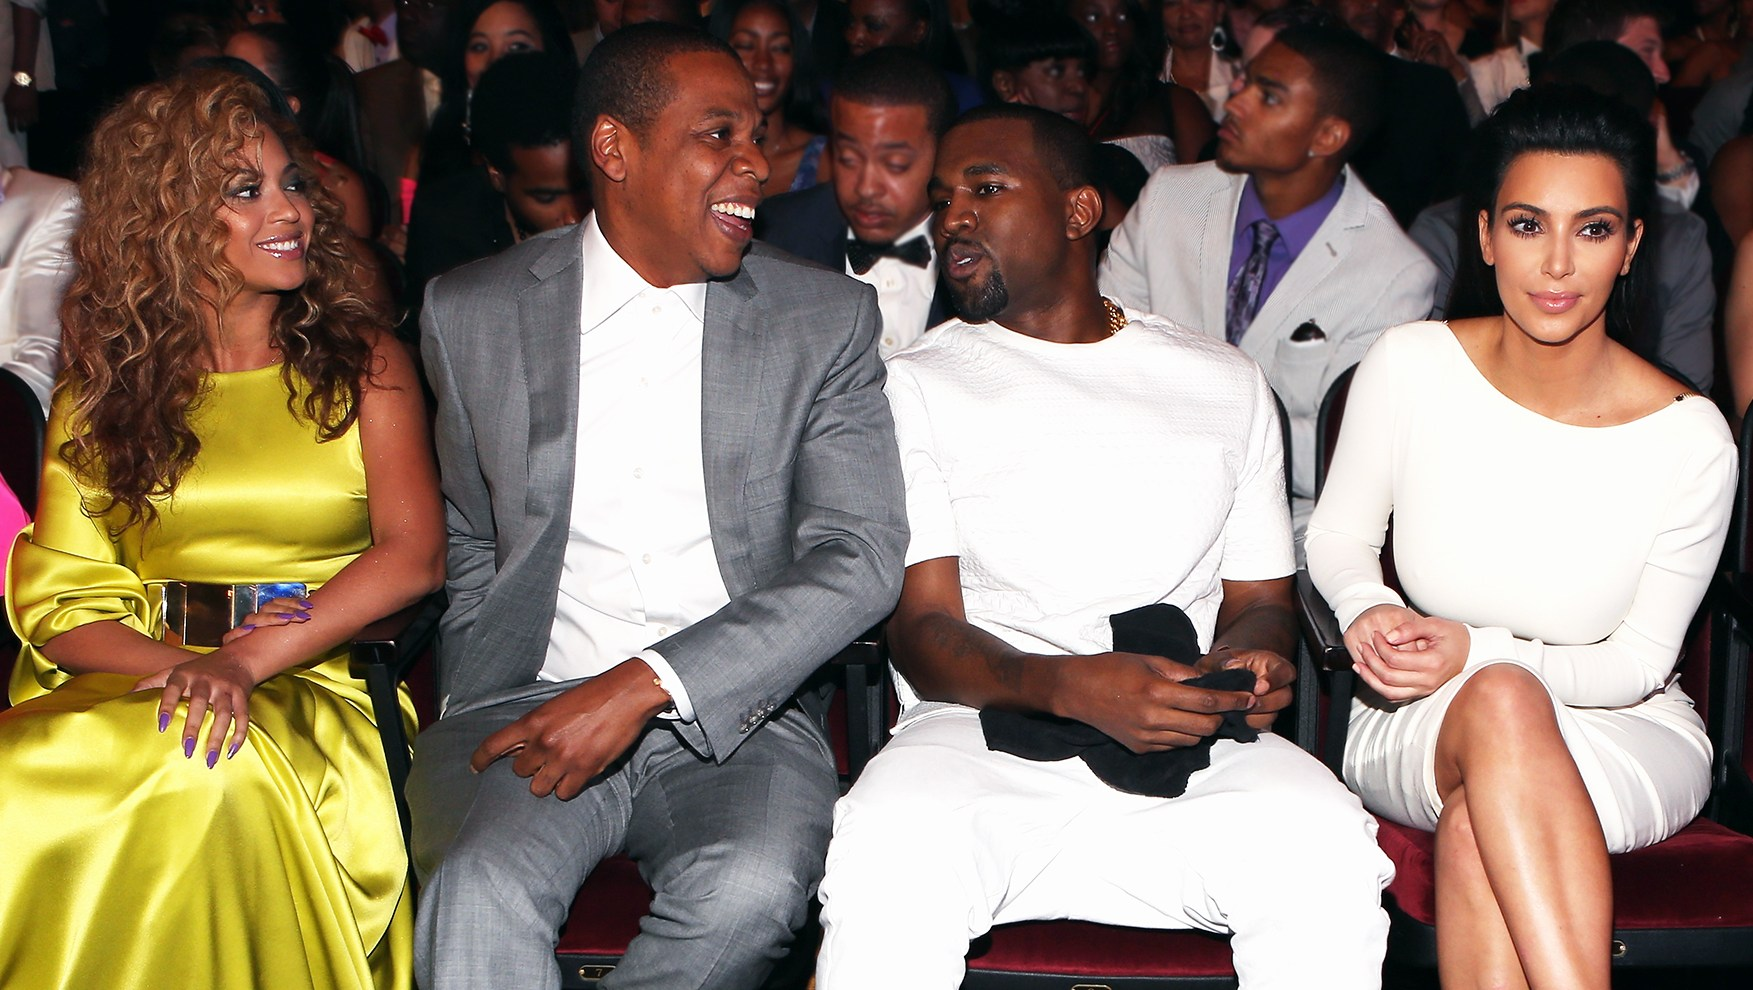 Kim Kardashian, Kanye West, Beyonce and Jay-Z Attend Travis Scott's Astroworld Concert